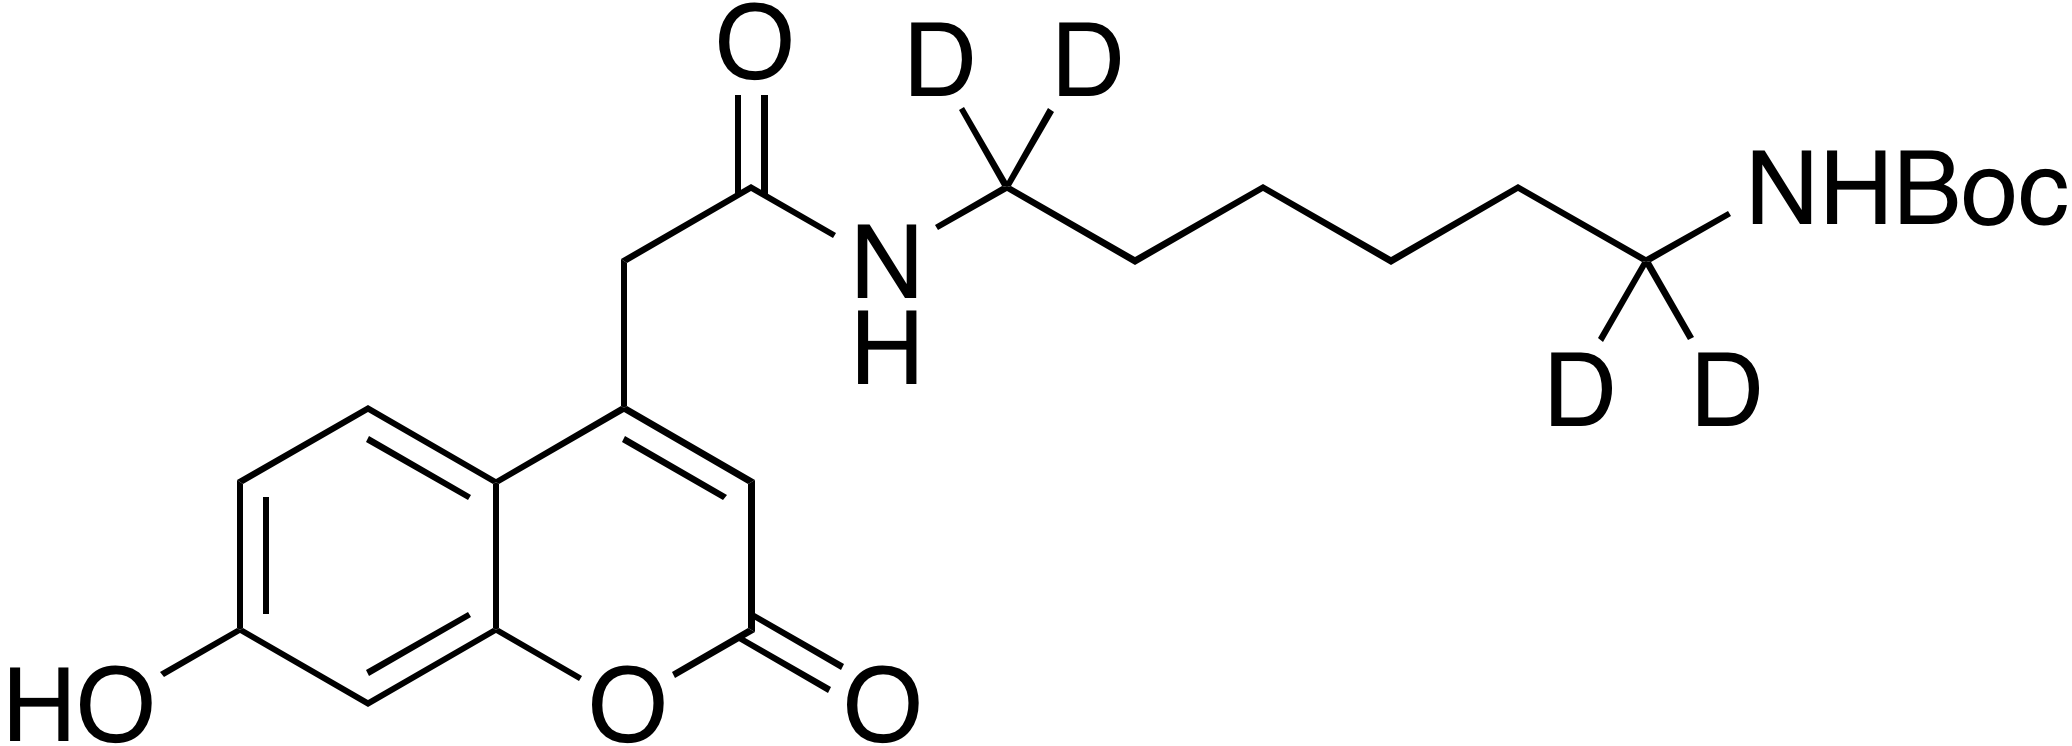 tert-Butyl 6-(7-hydroxycoumarin-4-acetamido)hexyl-d<sub>4</sub> carbamate